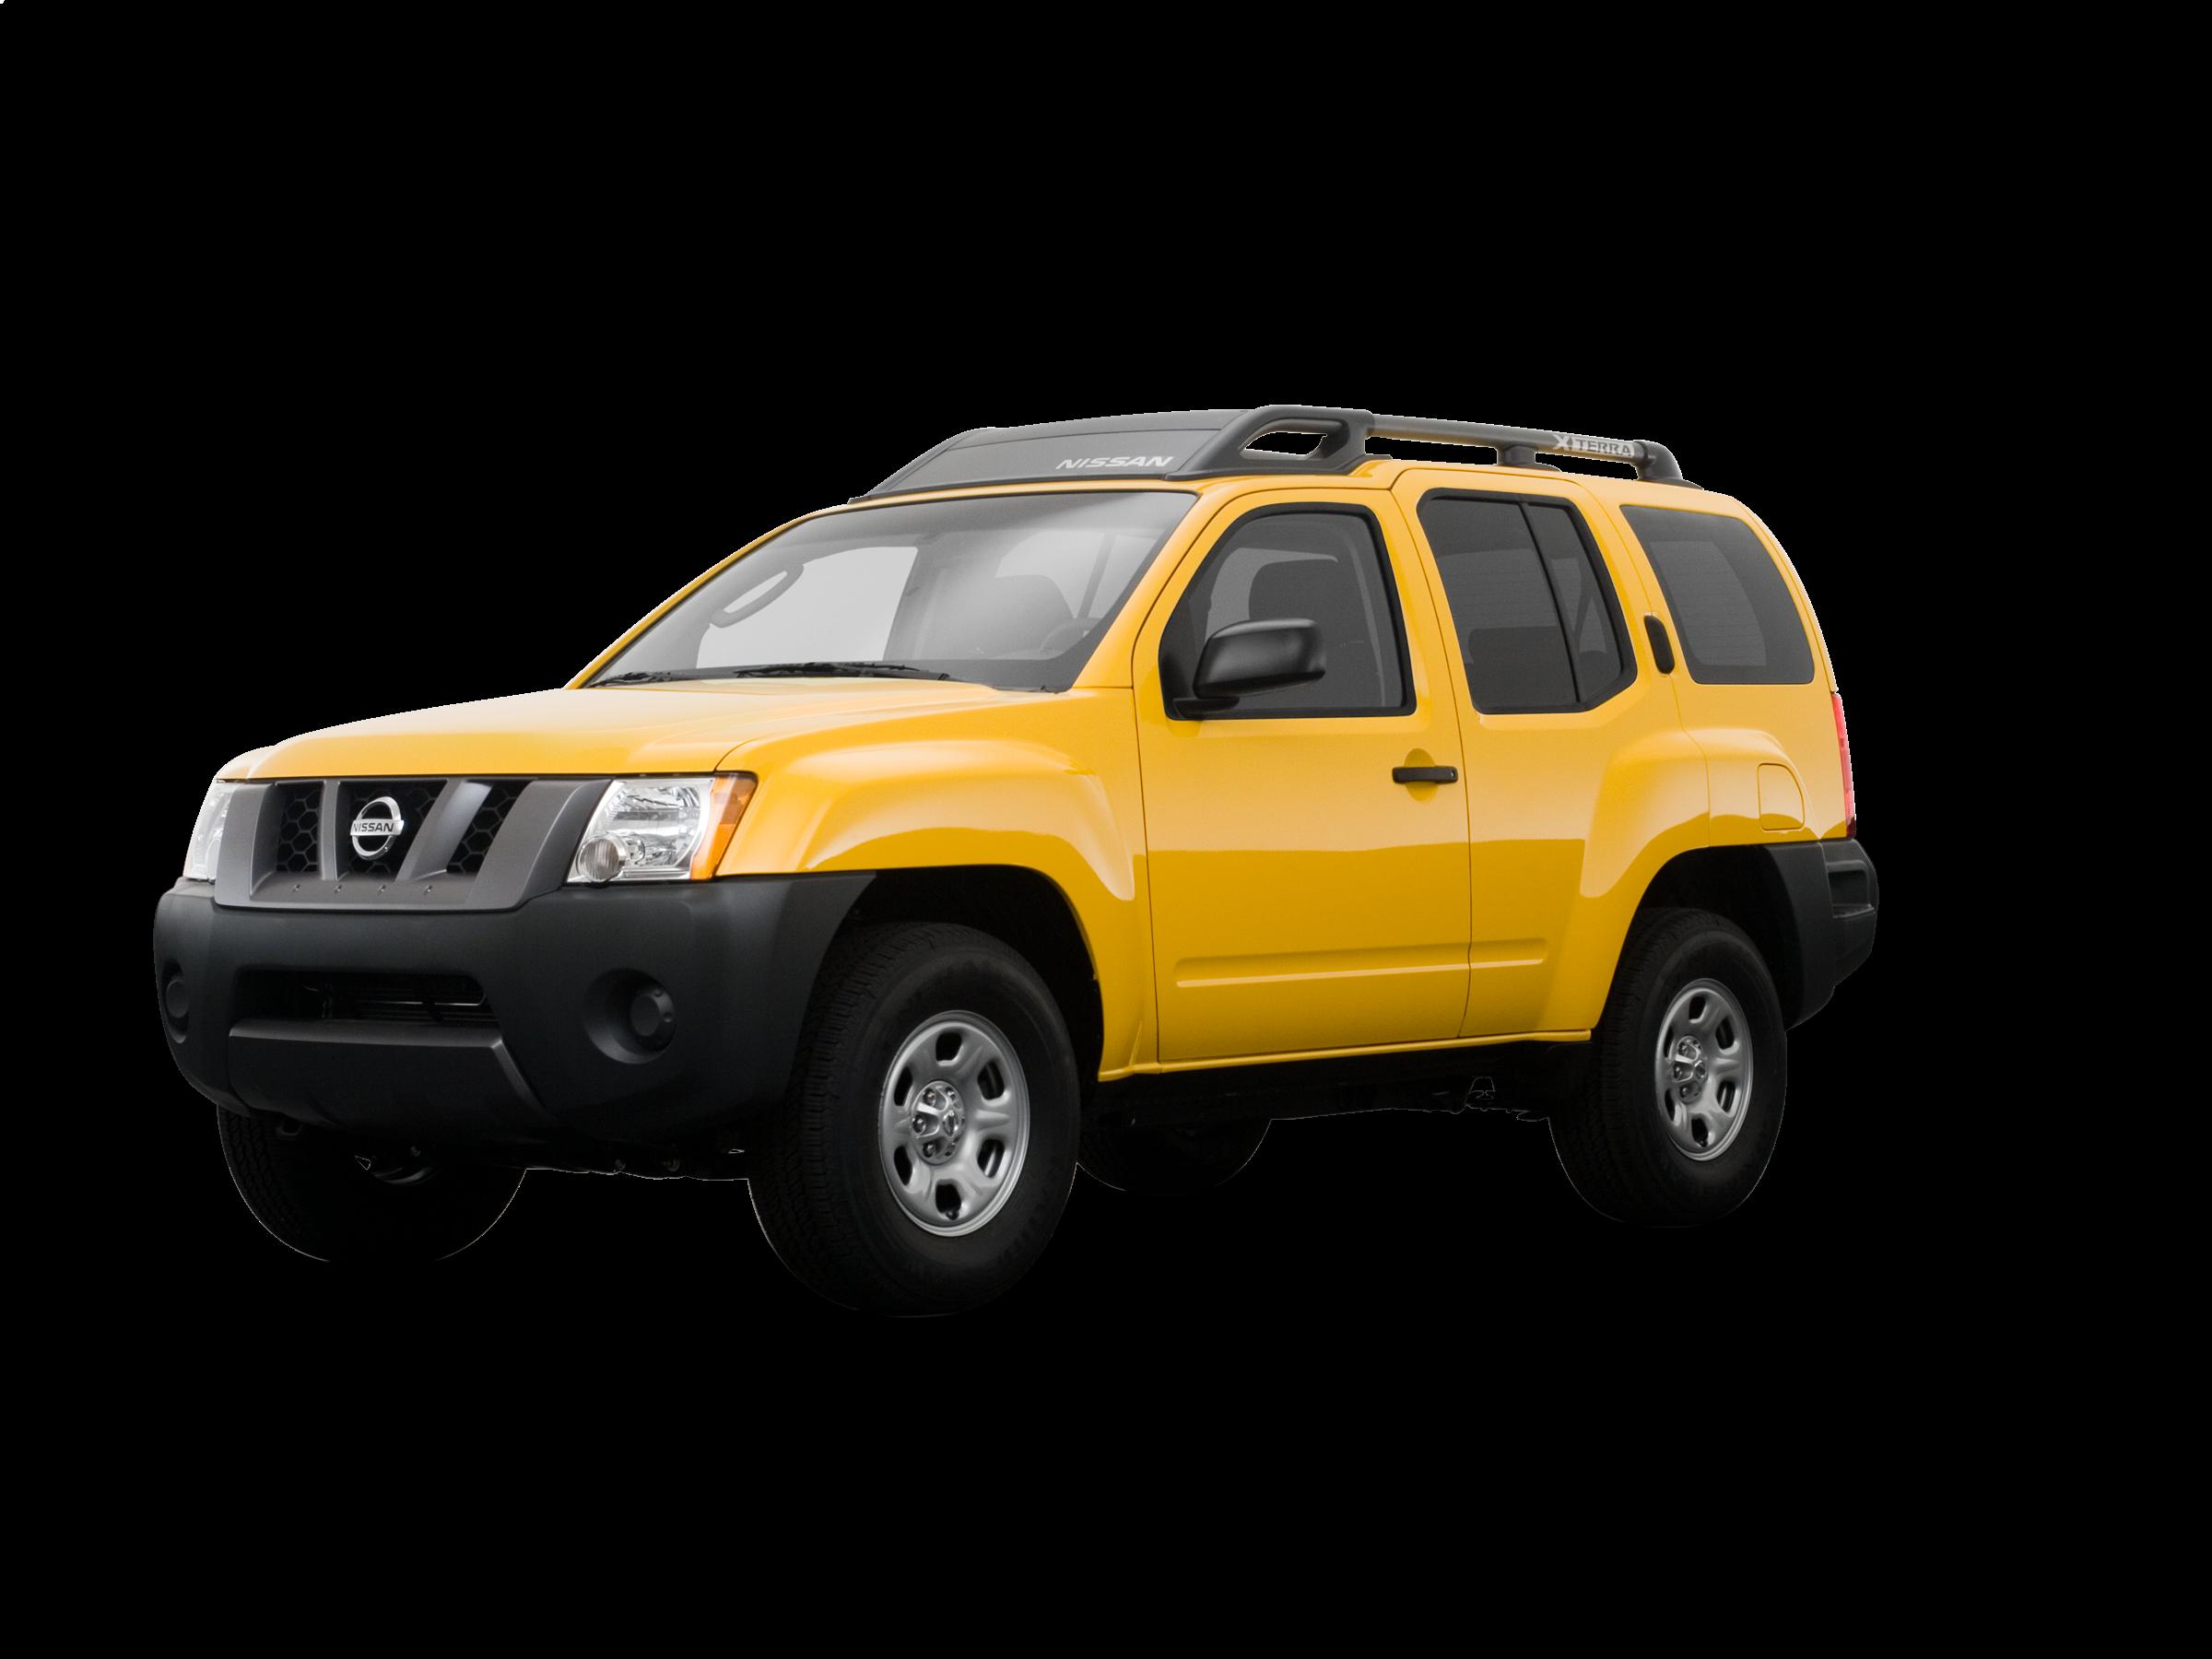 2008 Nissan Xterra Values Cars For Sale Kelley Blue Book